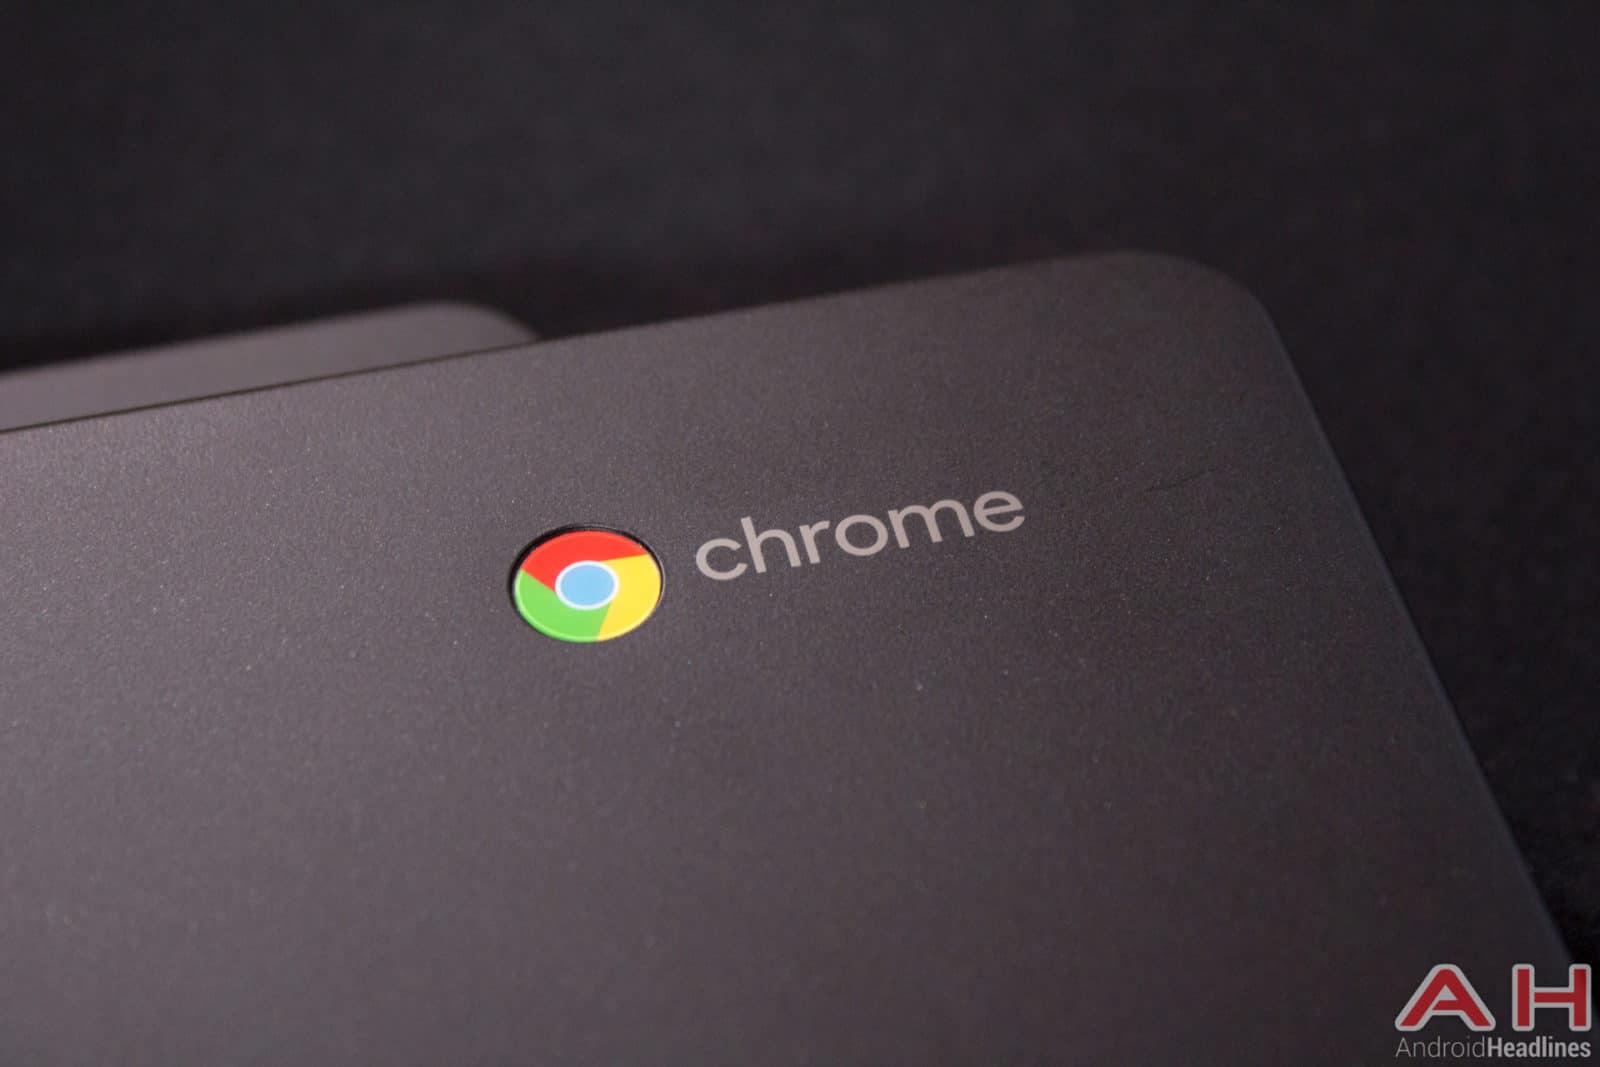 Lenovo Chrome ThinkPad 13 AH (6)